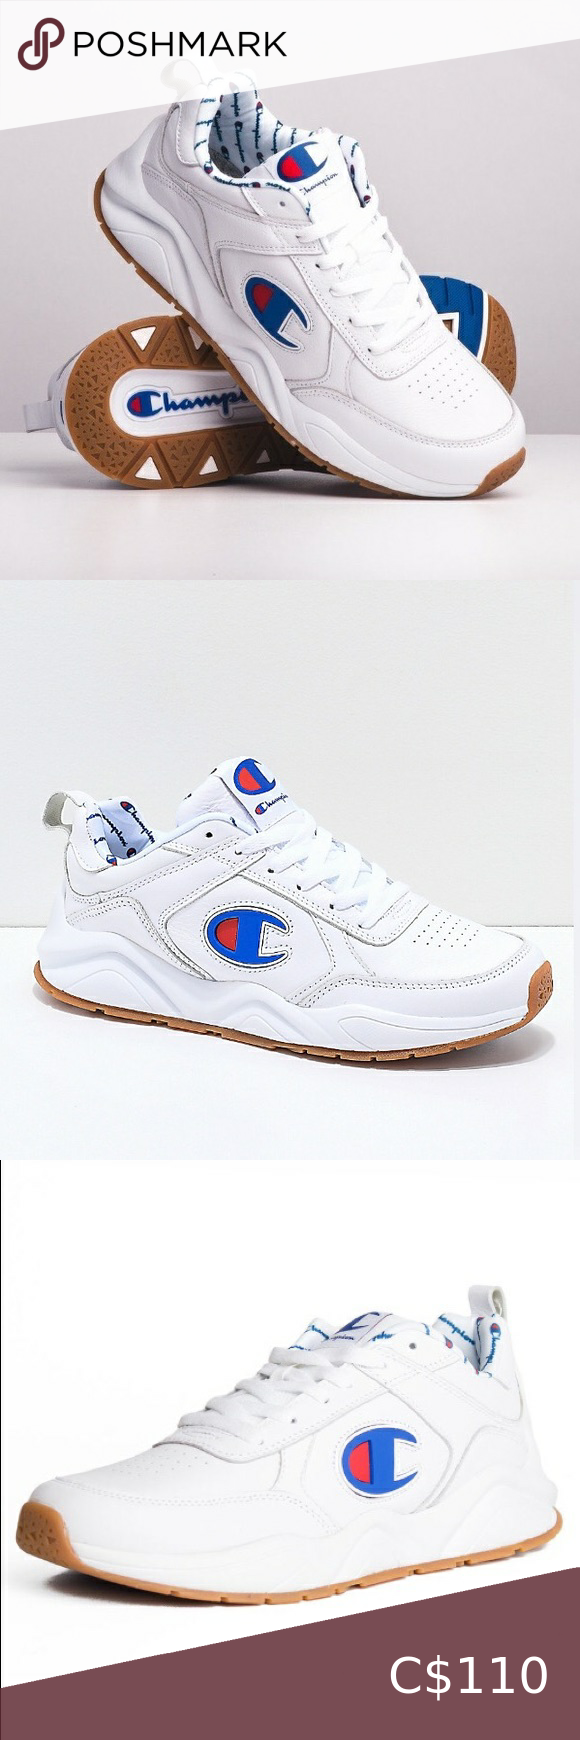 Host Pick Champion 98eighteen Big Sneakers Champion Classic White Sneakers In Style 98eighteen Big Sizes 9 12 Men S Avai Champion Shoes Dad Shoes Basic Shoes [ 1740 x 580 Pixel ]